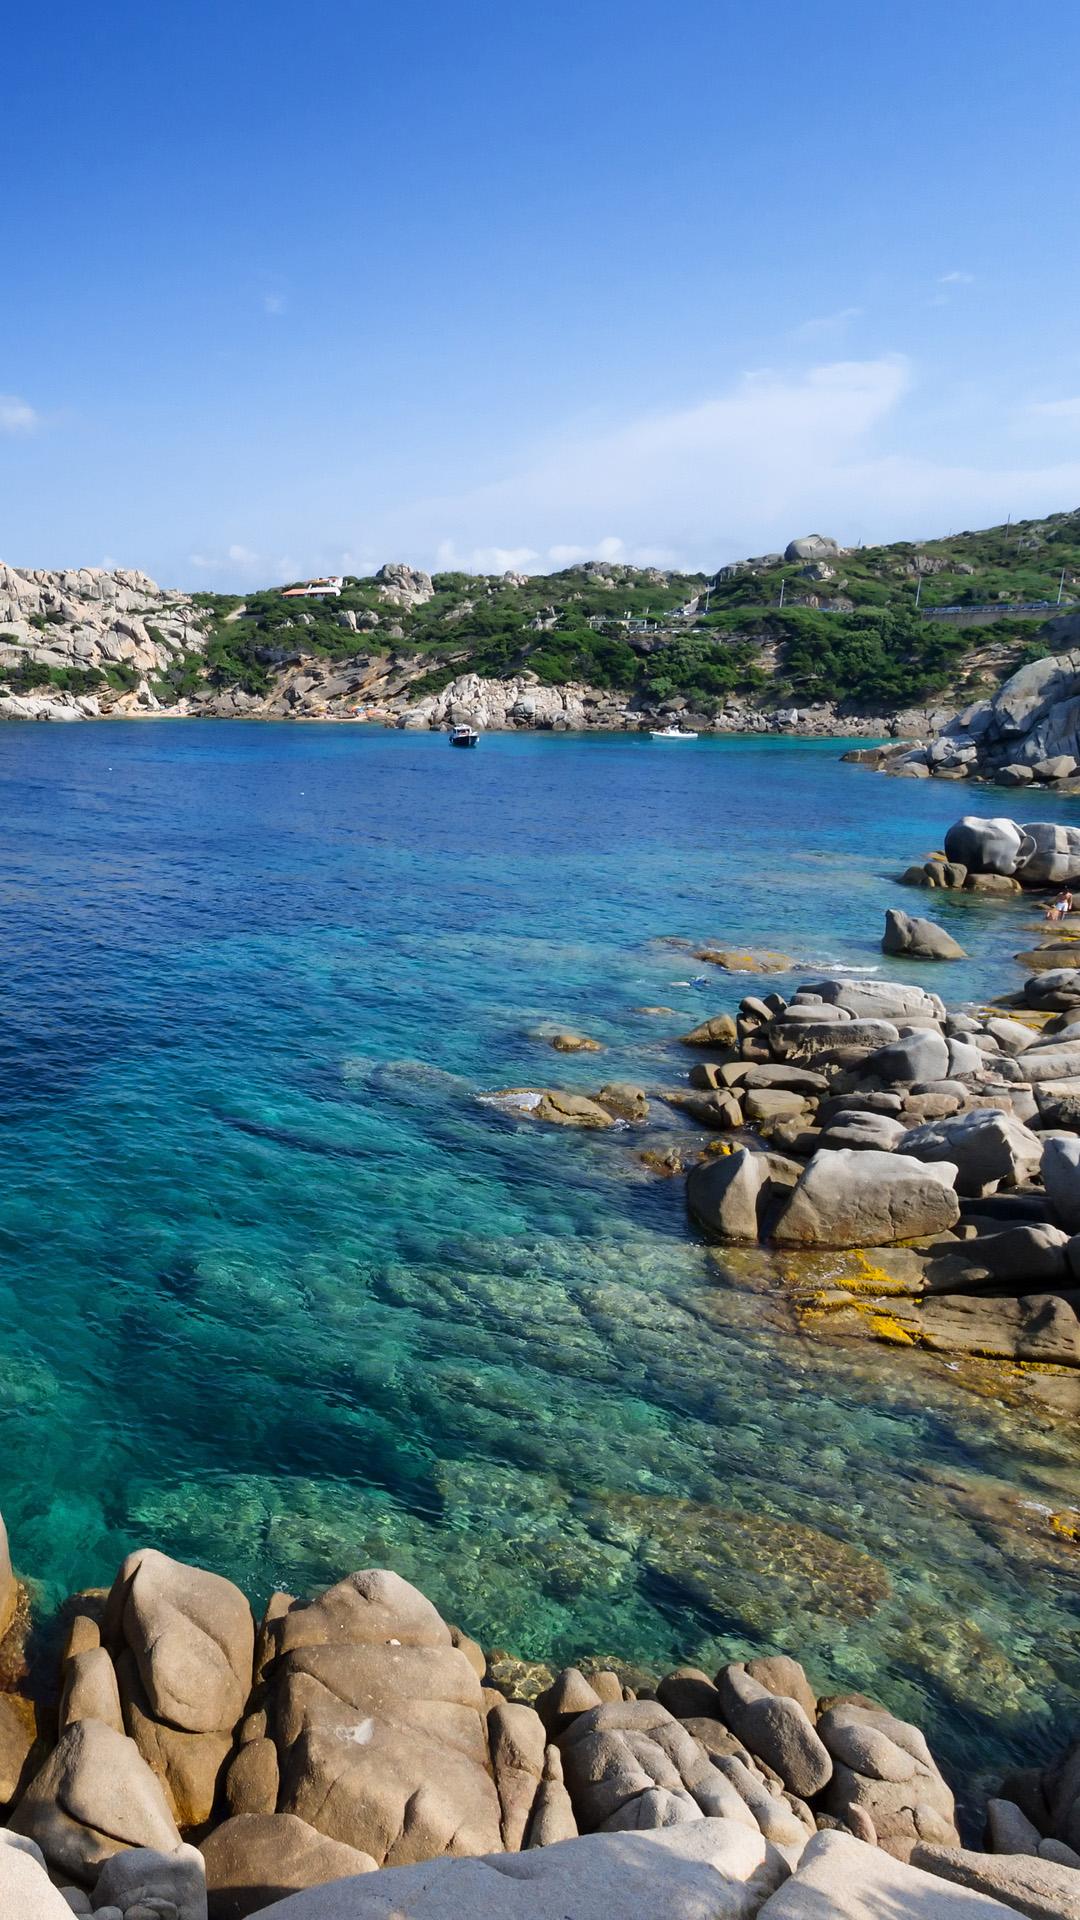 Scenic rocky coast